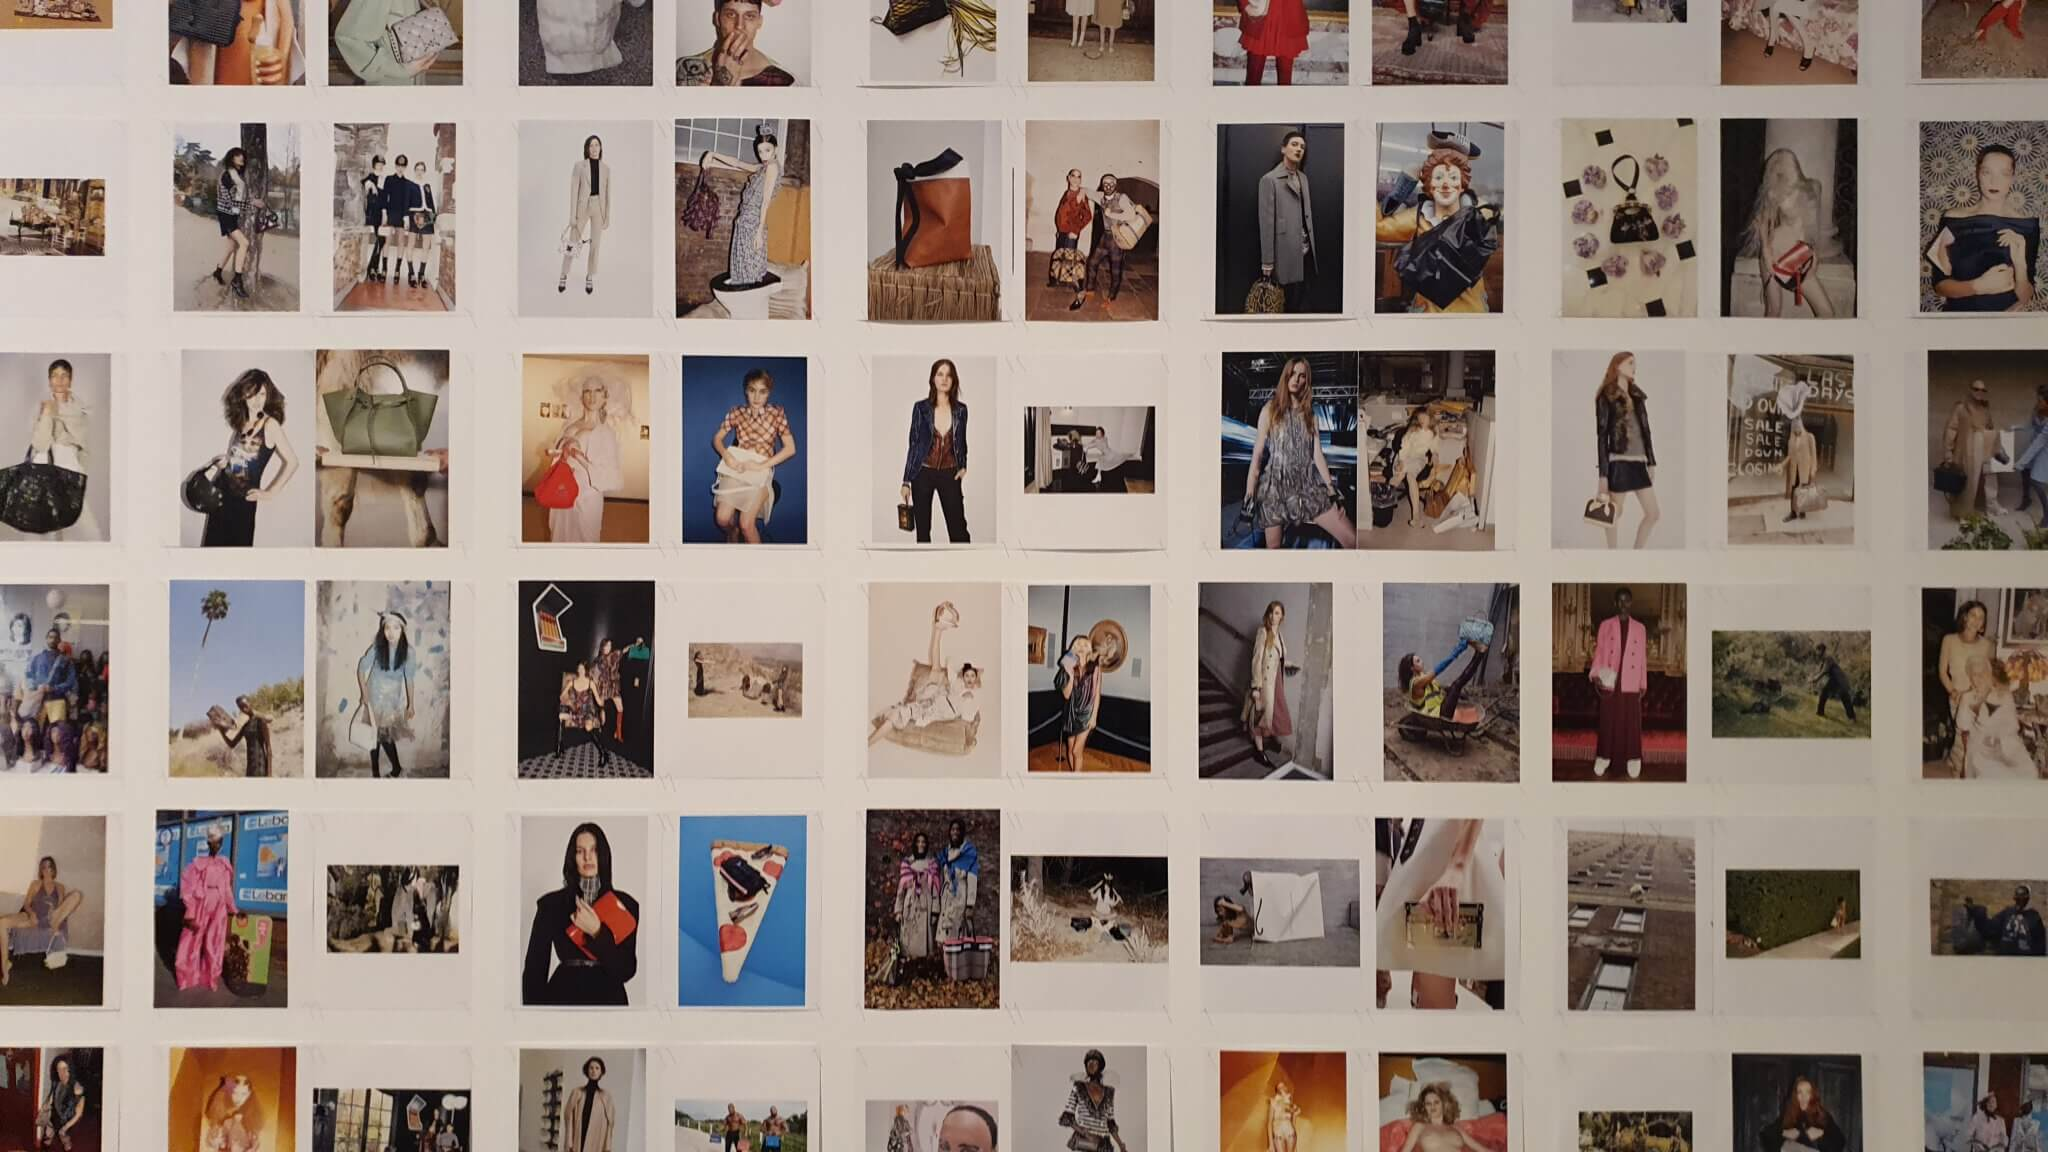 Handbag Wall of Fame in der Dress Code - Ausstellung Bundeskunsthalle Bonn 2021